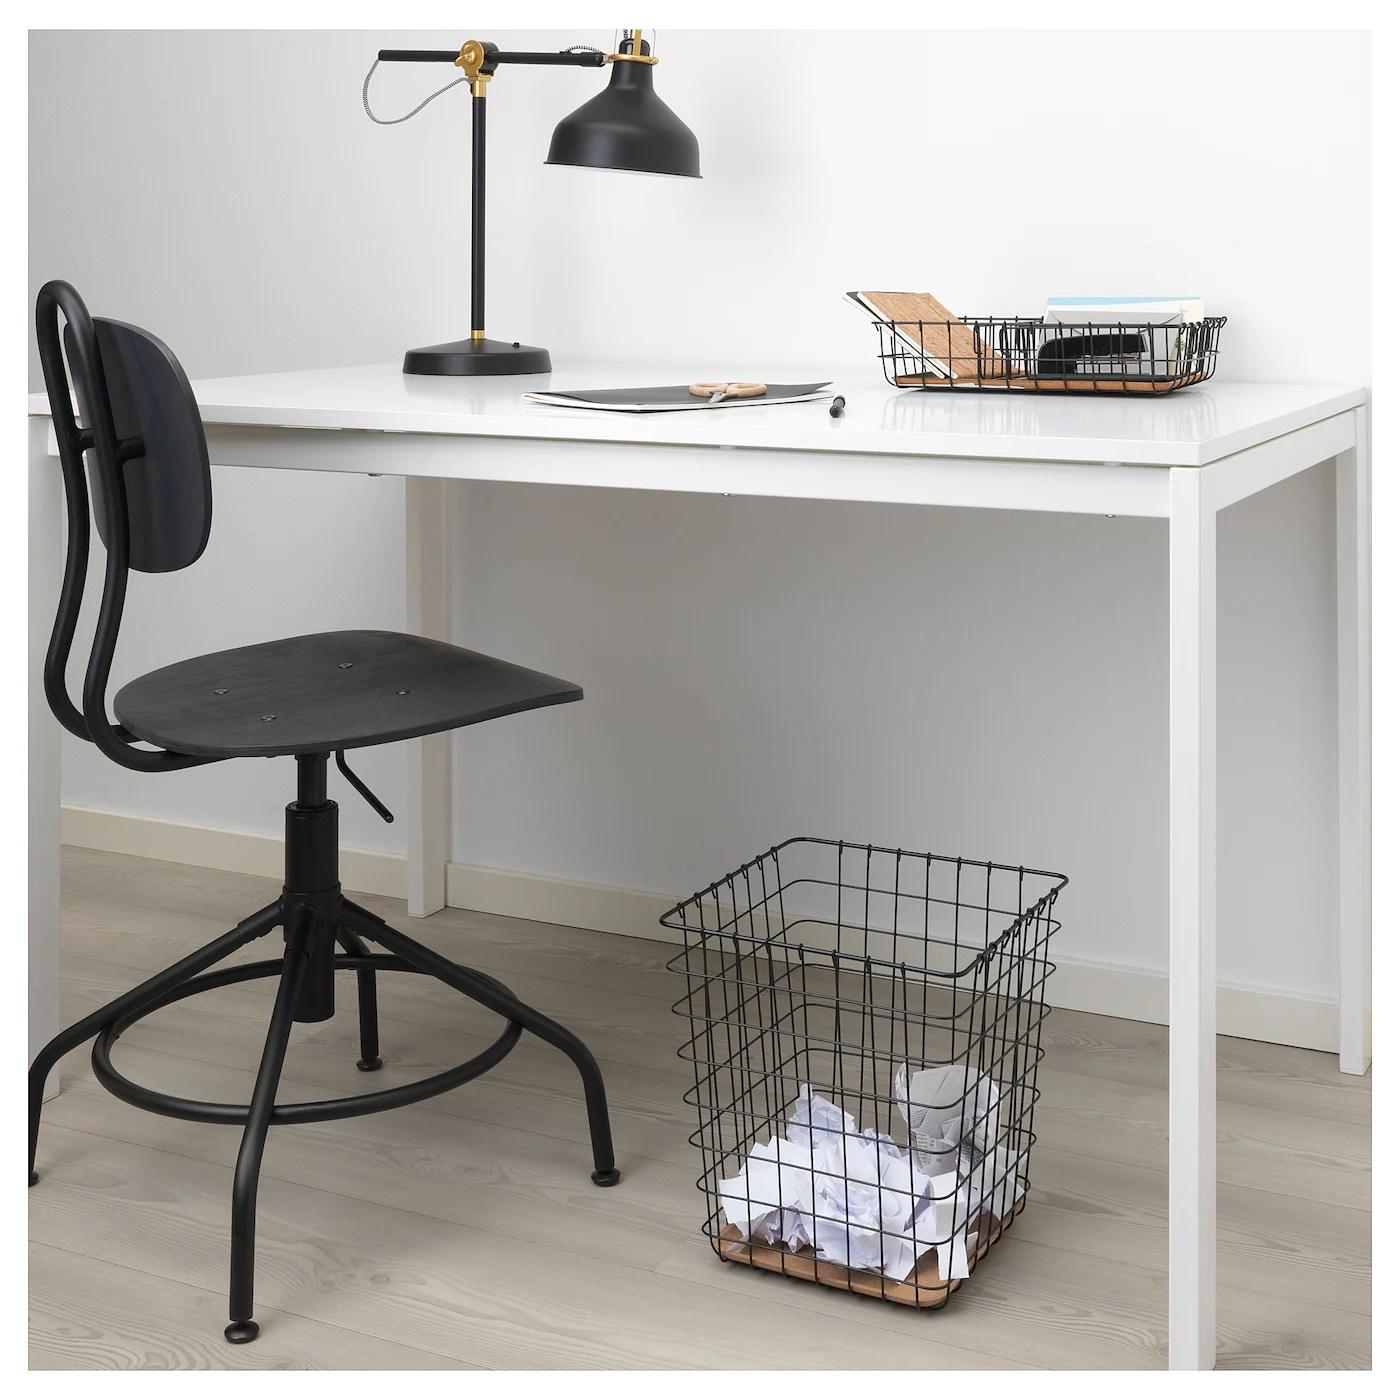 Pleja Corbeille A Papier Noir 20 L Ikea